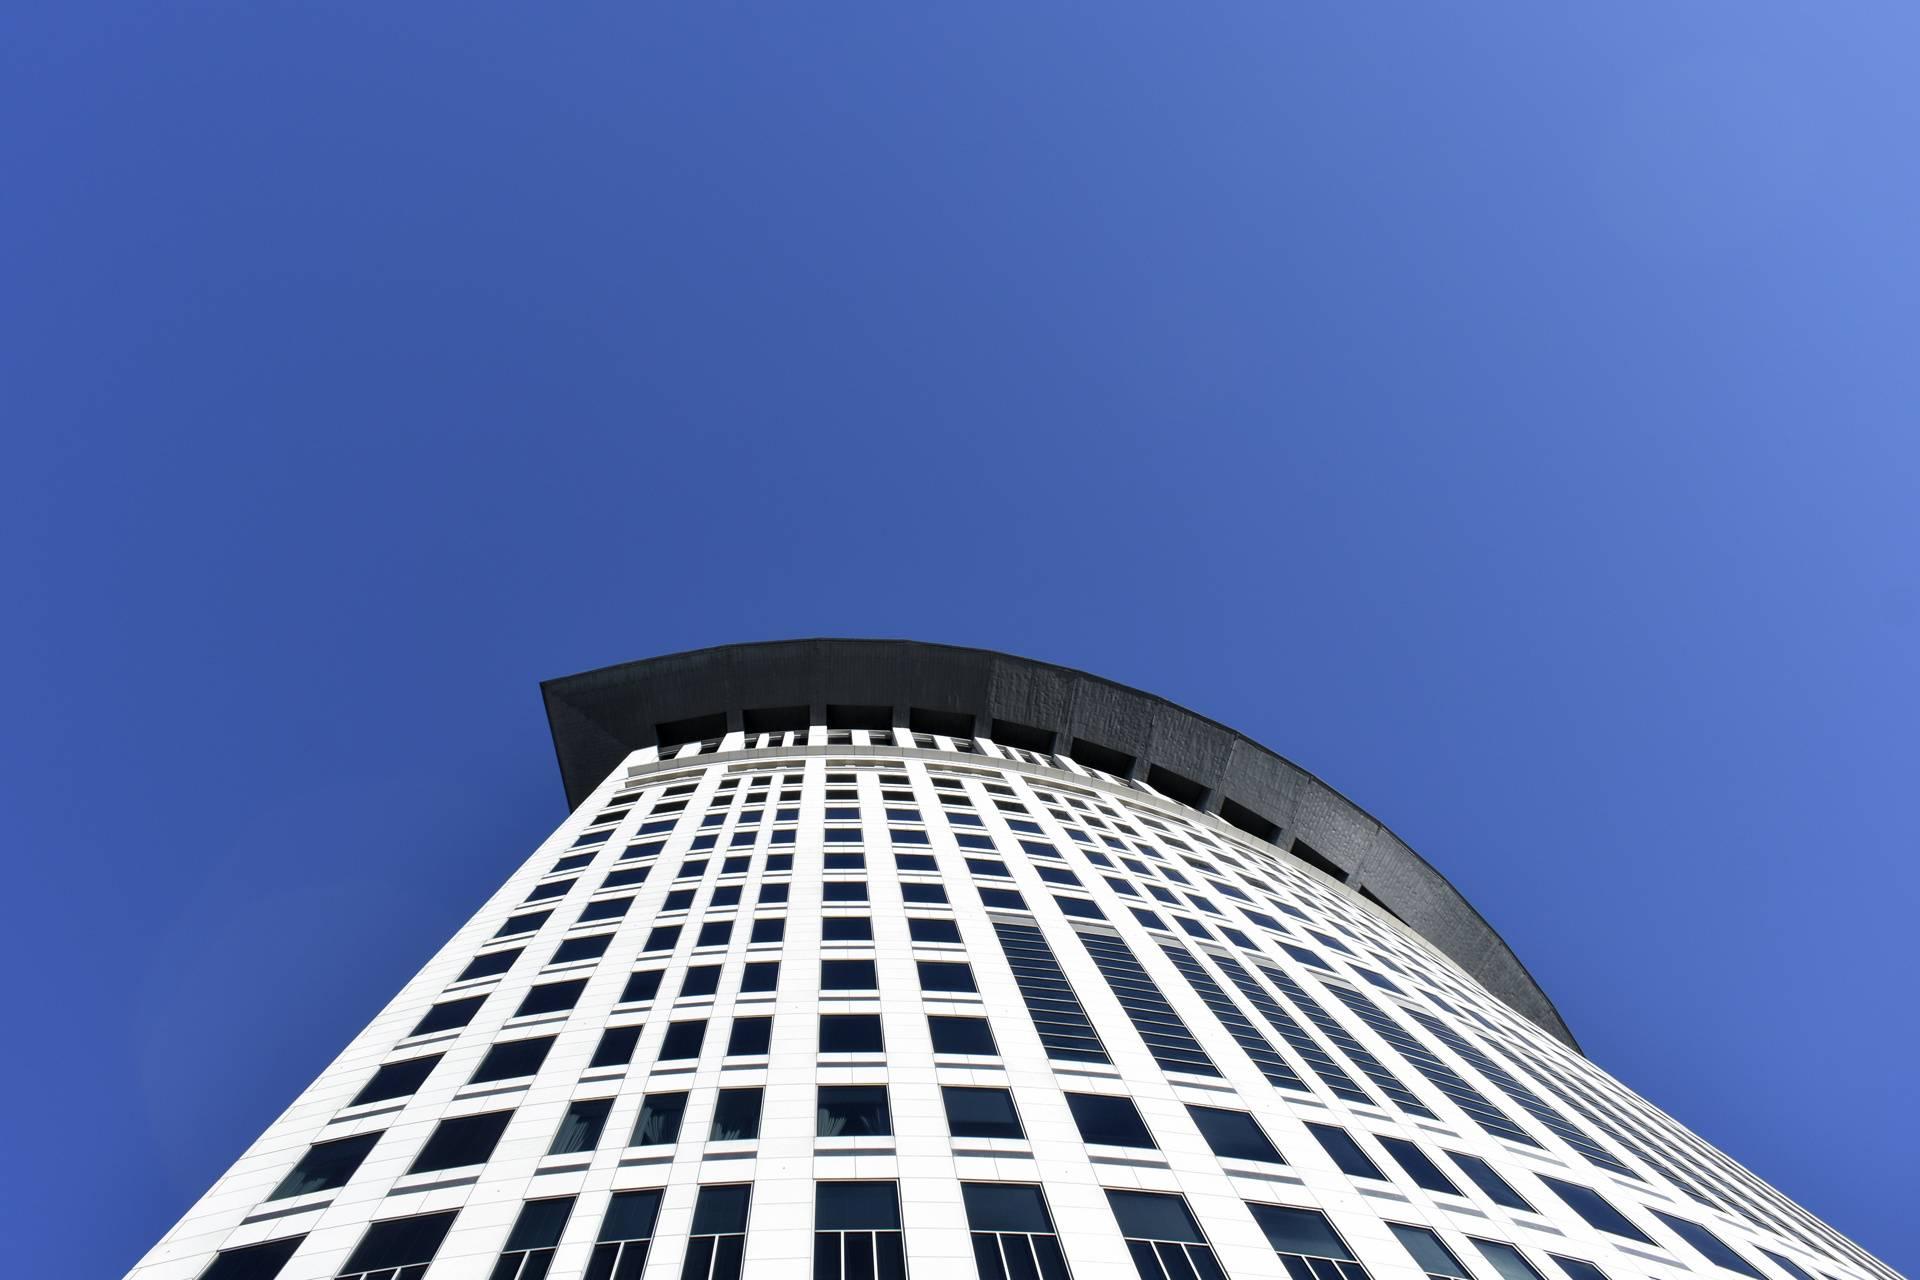 Cleveland building